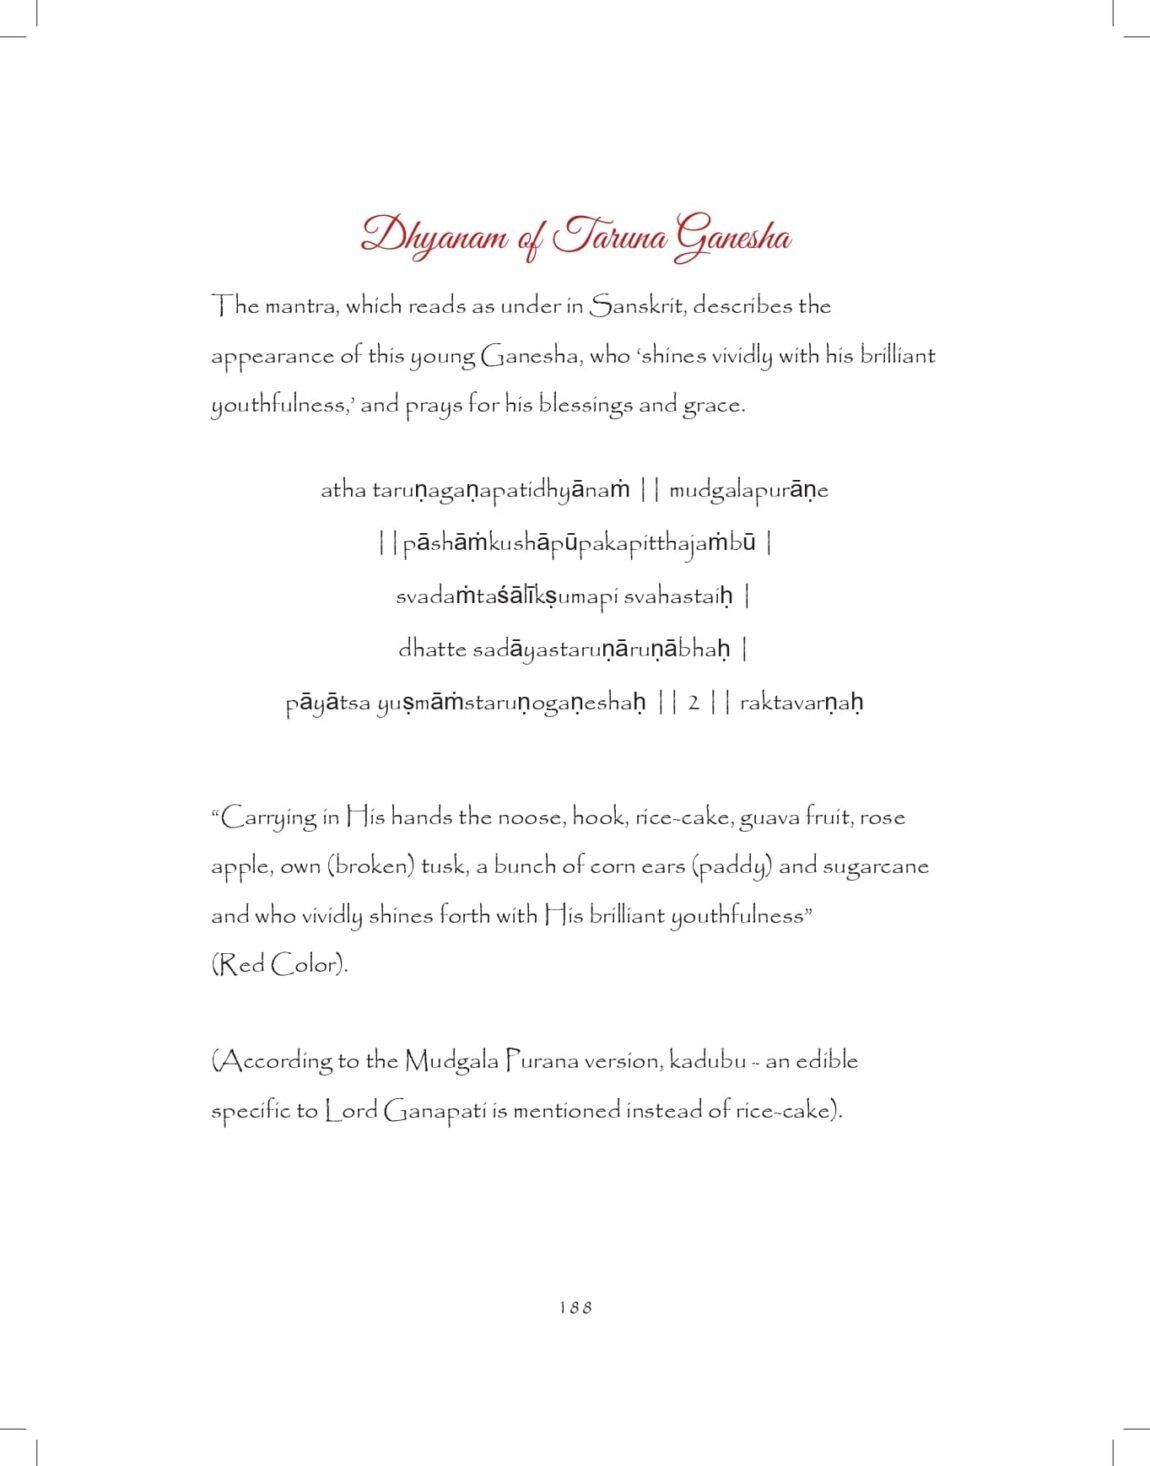 Ganesh-print_pages-to-jpg-0188.jpg